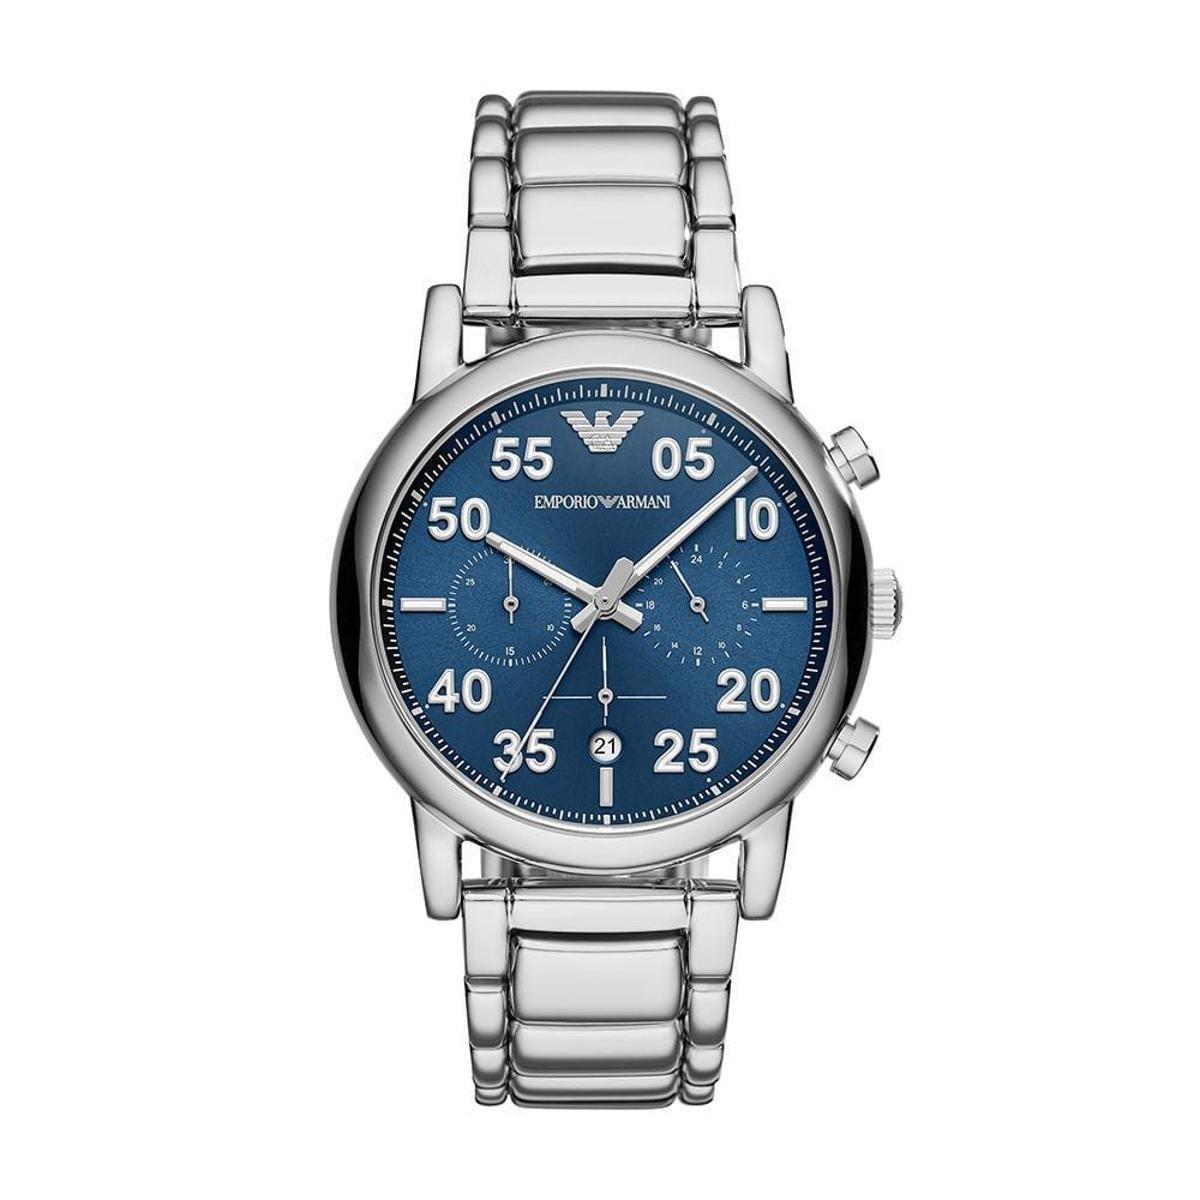 5f086accc24 Relógio Empório Armani Masculino Luigi - AR11132 1KN AR11132 1KN - Prata -  Compre Agora